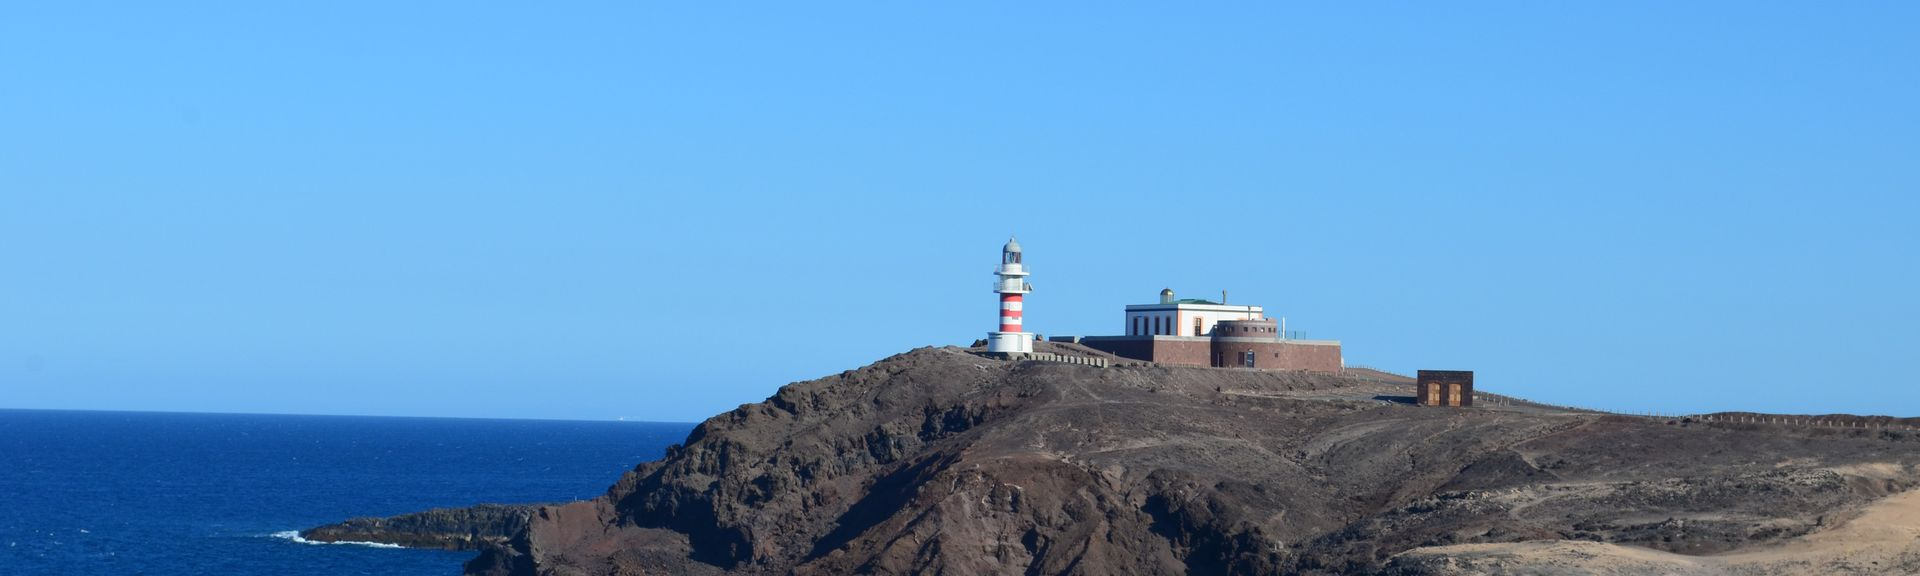 Agüimes, Îles Canaries, Espagne